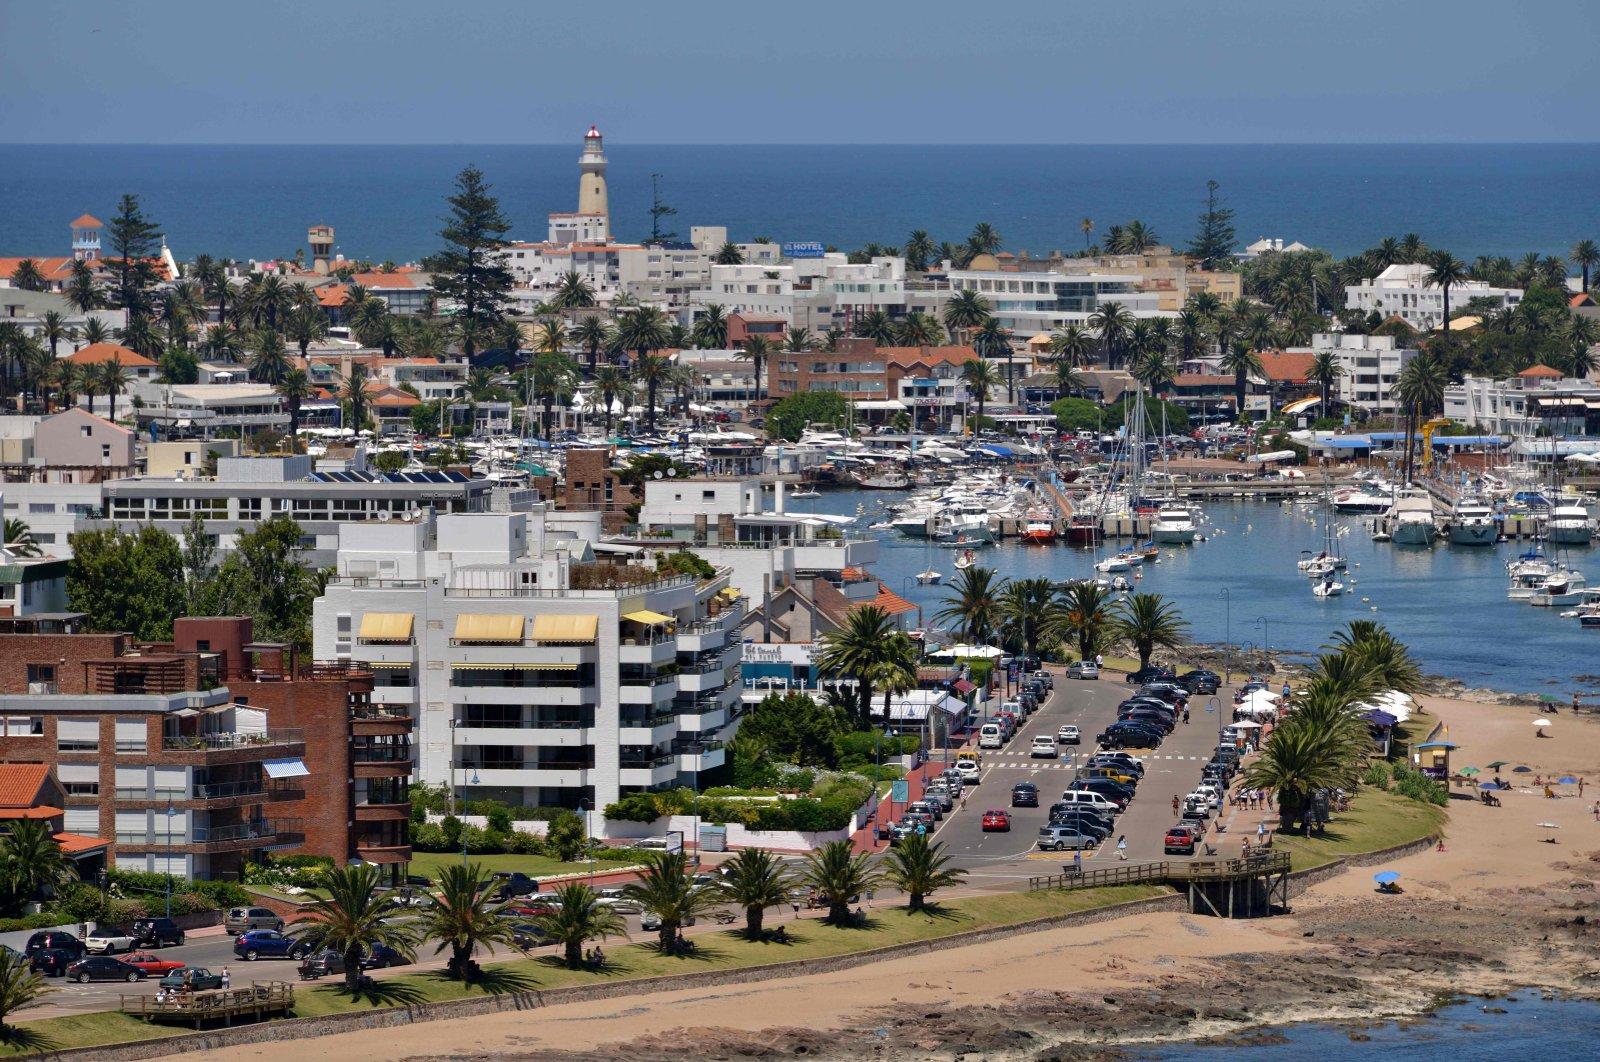 A view of the Uruguayan seaside resort of Punta del Este, 135 kilometers east of the capital Montevideo, Jan. 15, 2014. (AFP Photo)